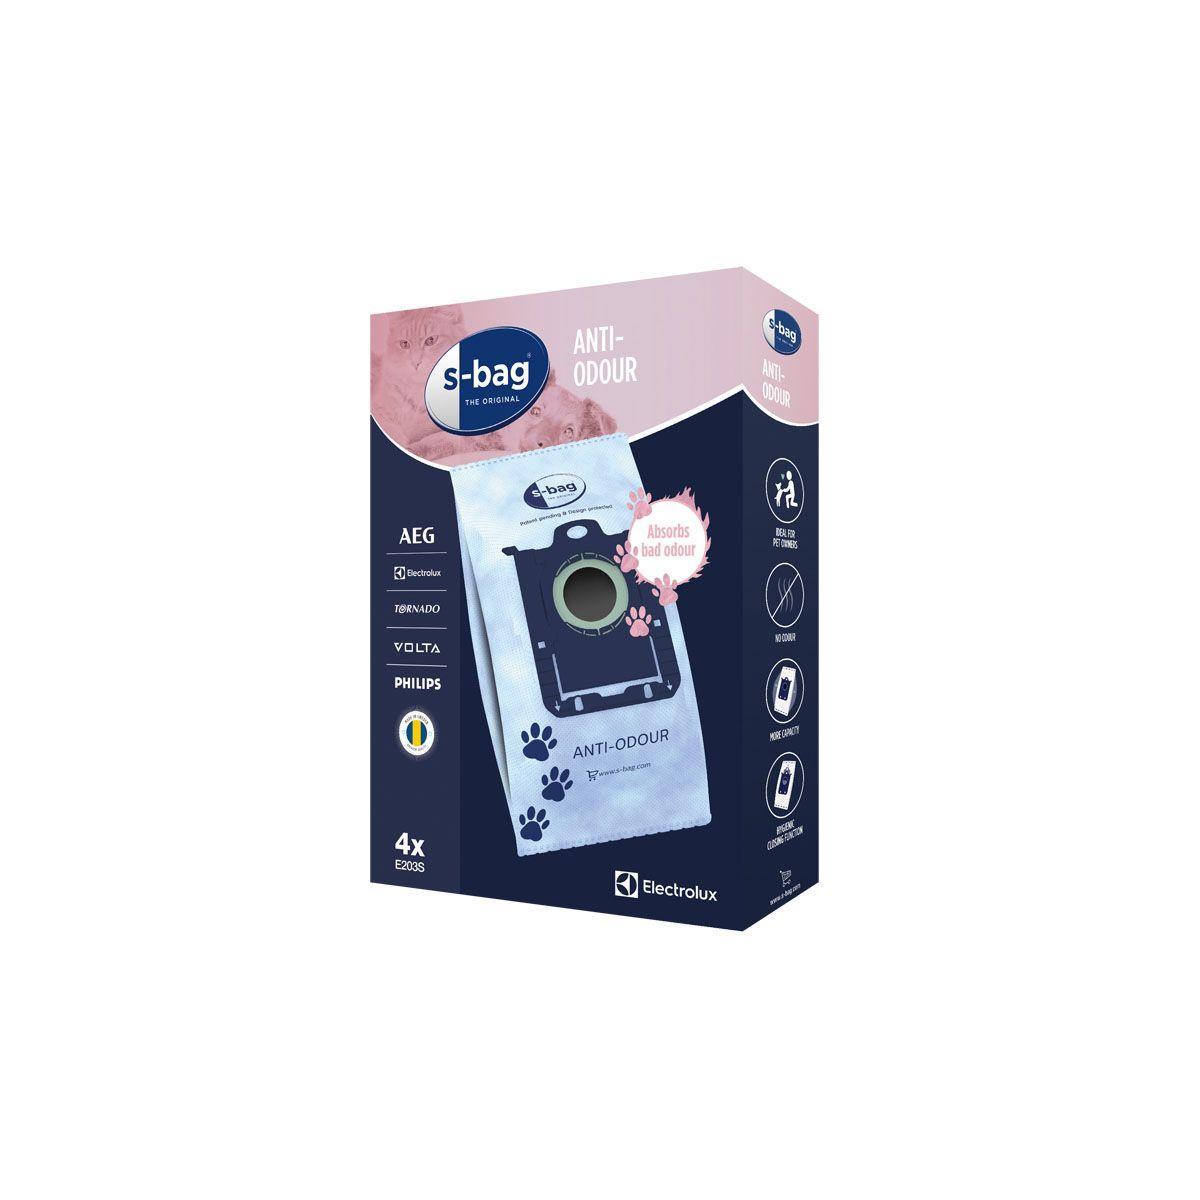 Sac aspirateur electrolux s-bag e203s anti odeurs